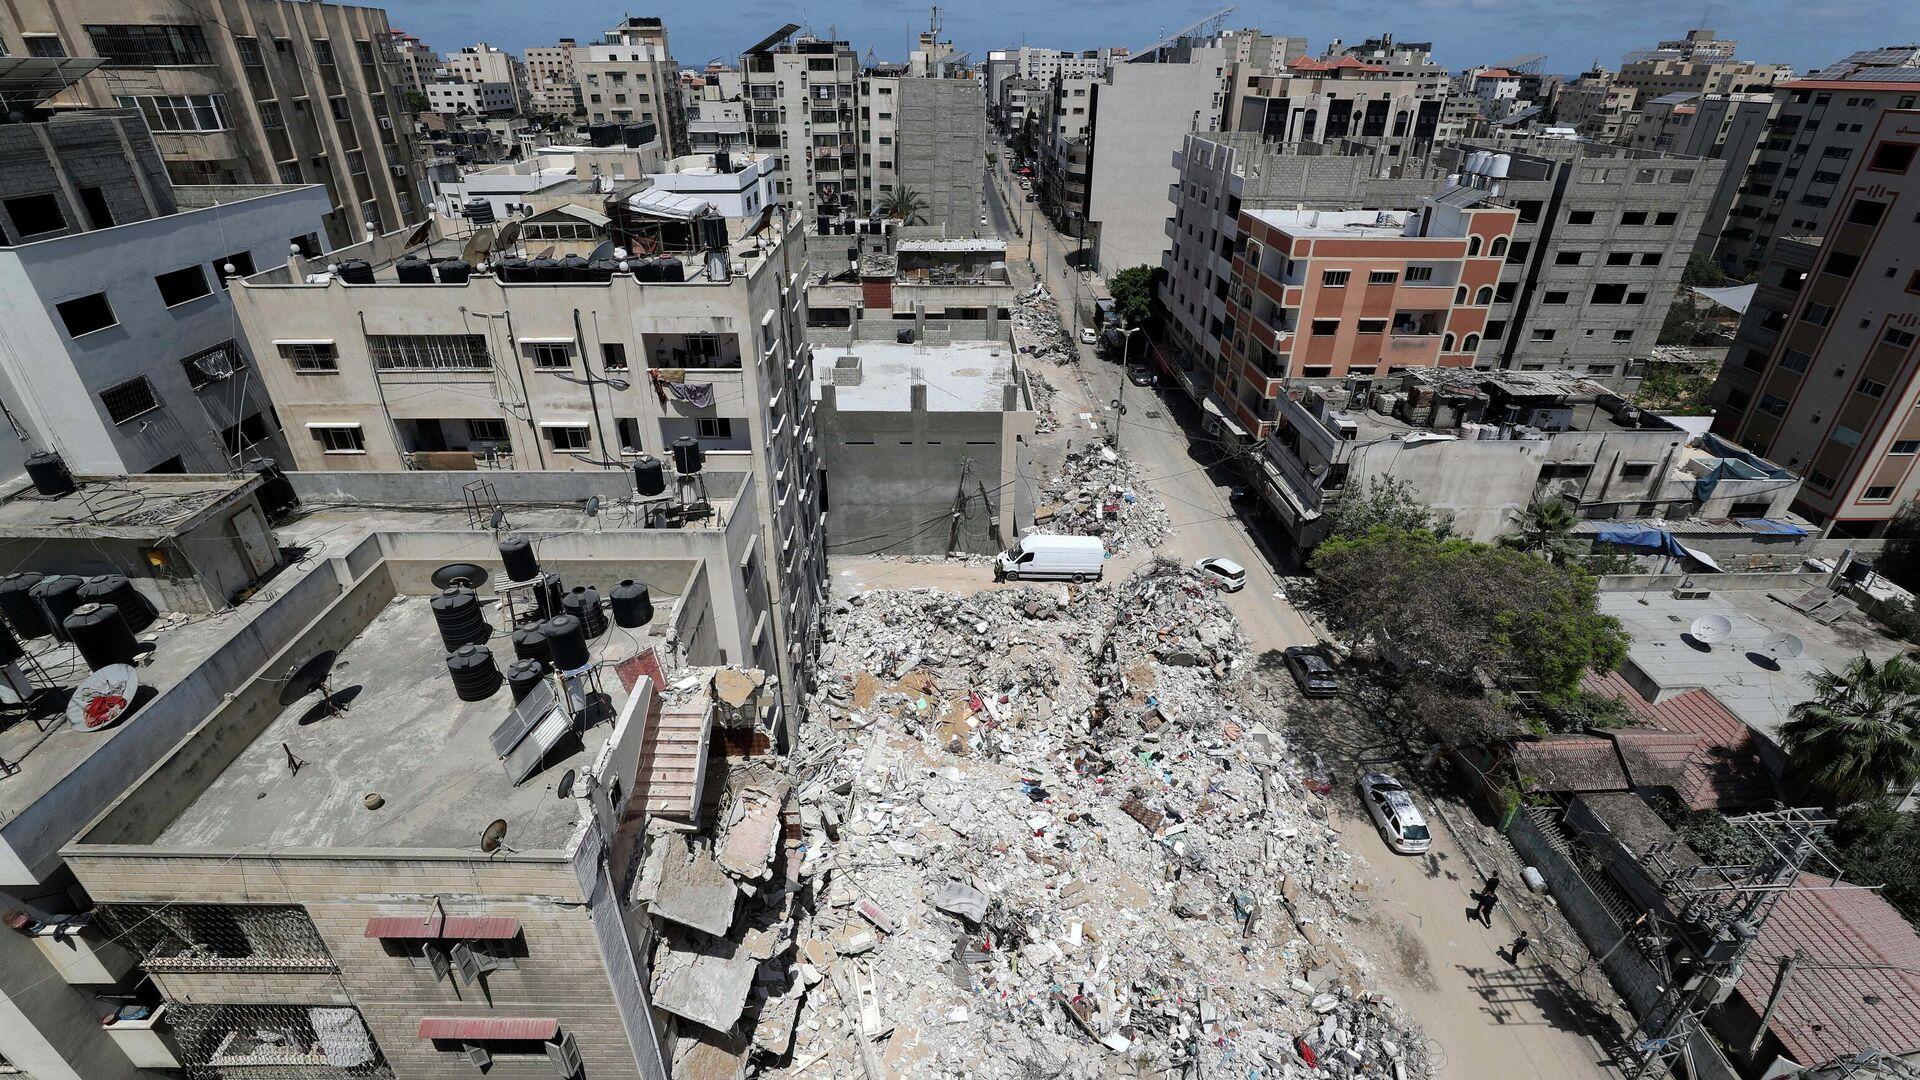 Edificios destruidos en la Franja de Gaza - Sputnik Mundo, 1920, 21.05.2021